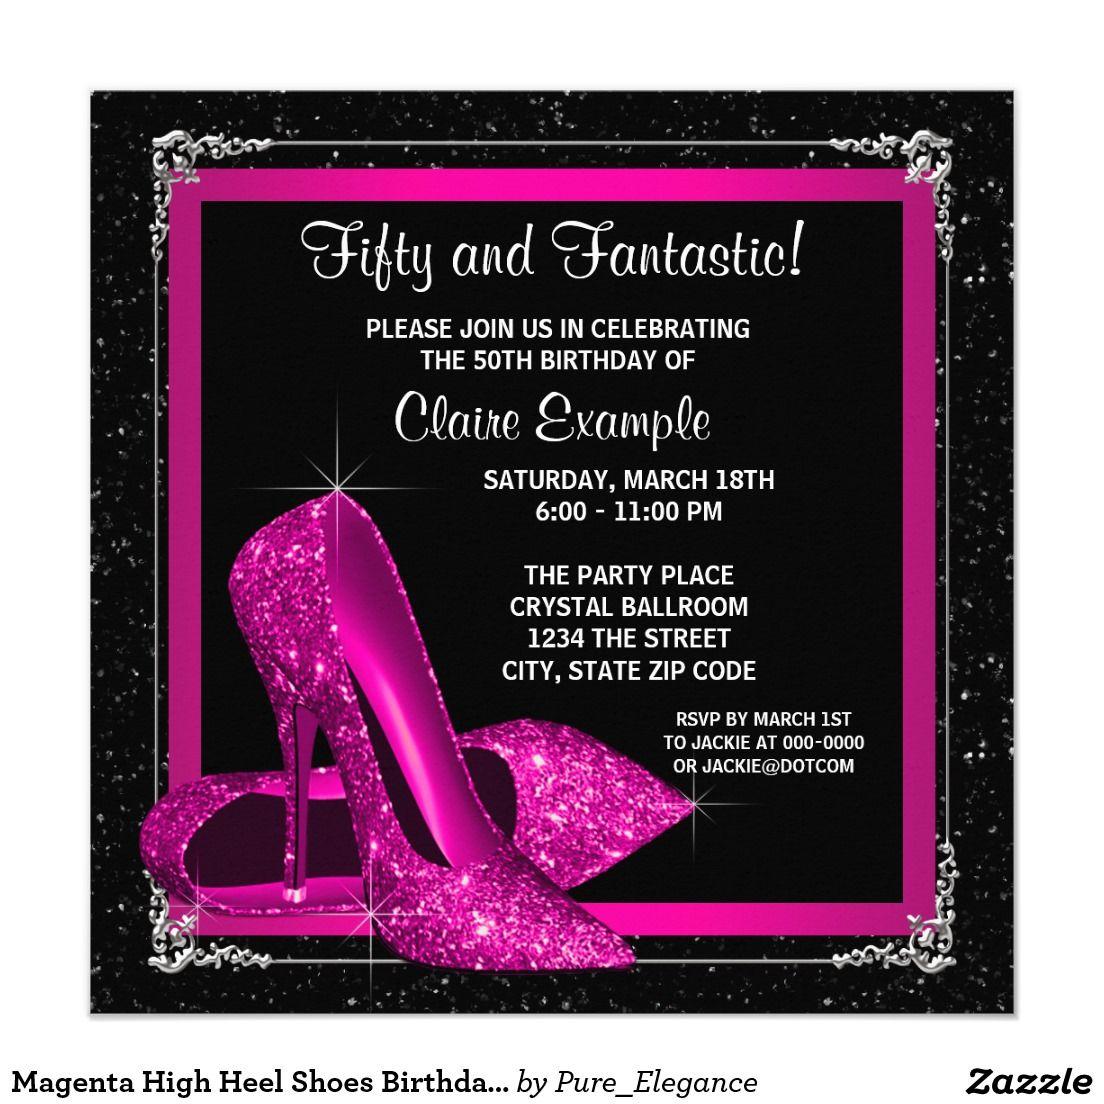 Magenta High Heel Shoes Birthday Party Invitation Zazzle